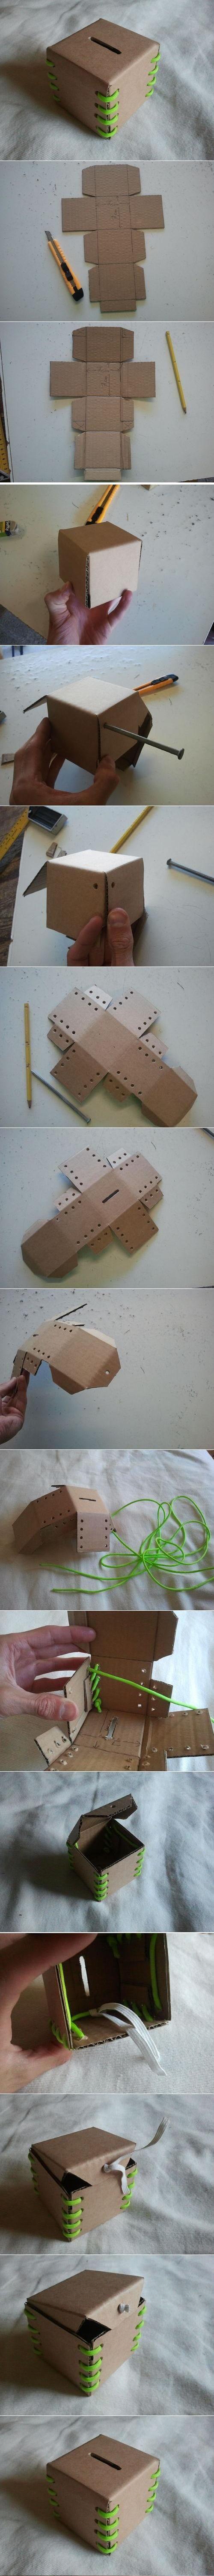 Cardboard cube money box